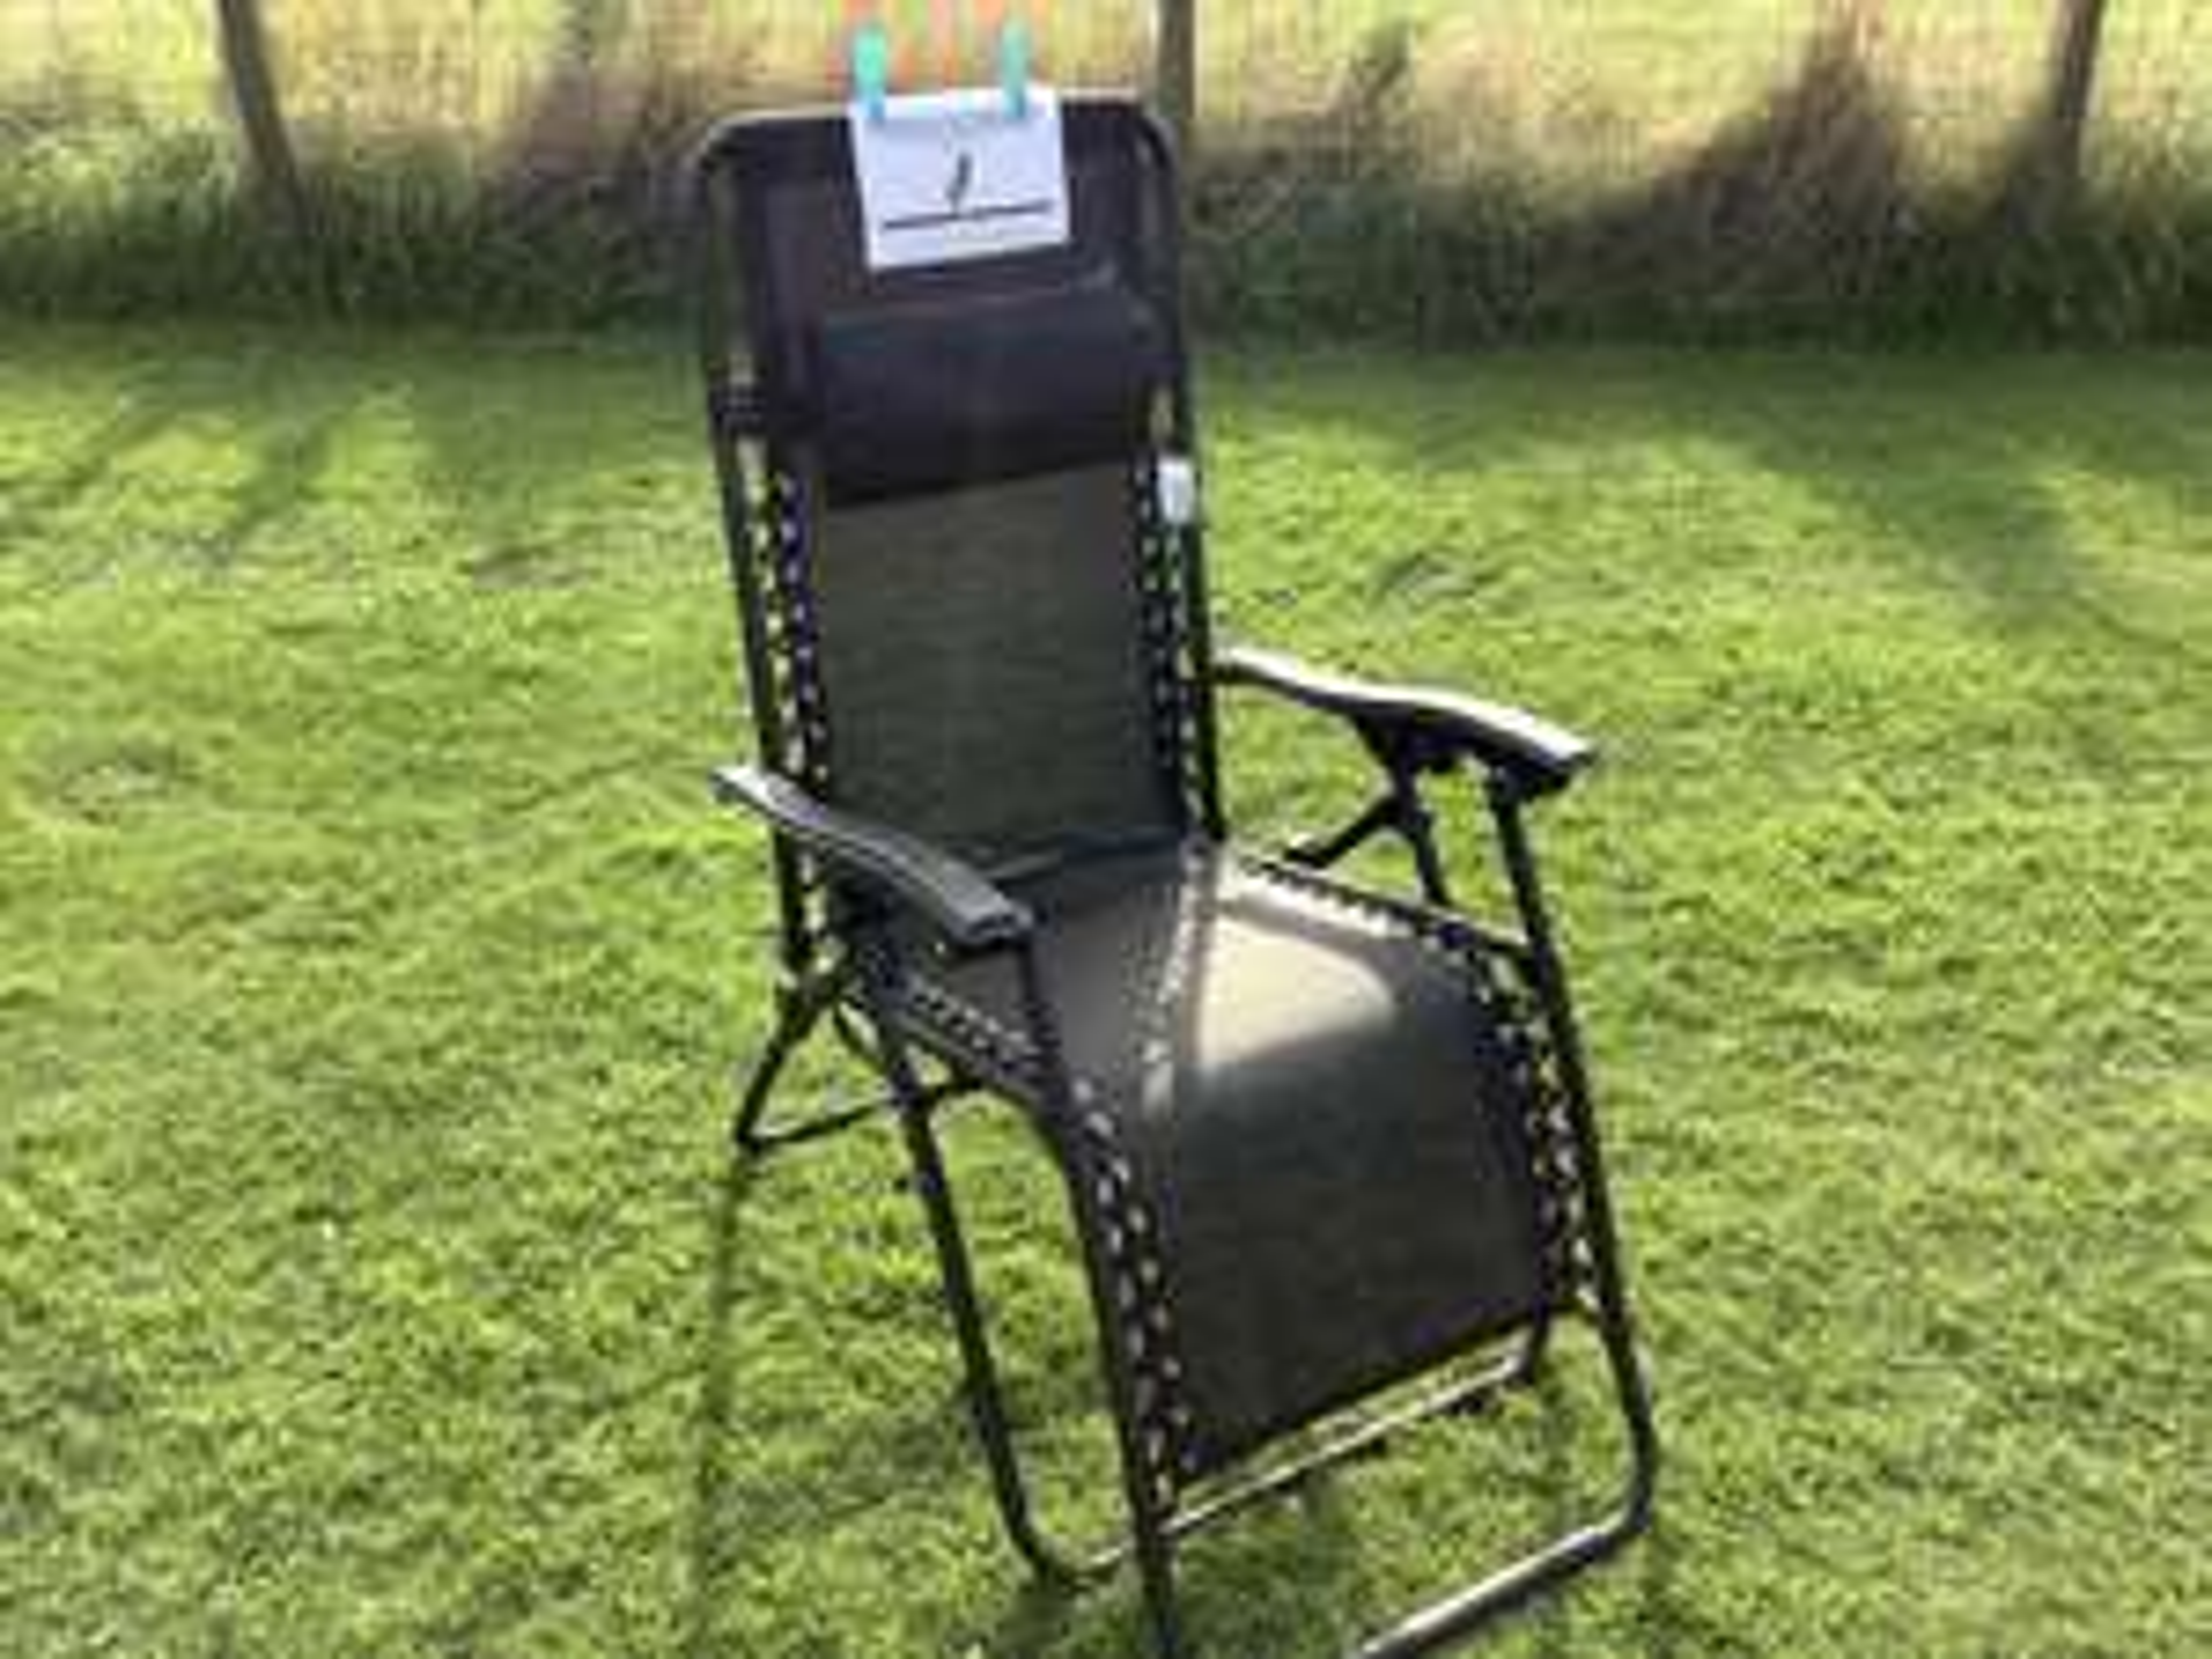 Zero Gravity Chair Tesco at Castle Douglas £30 each or 2 for £50